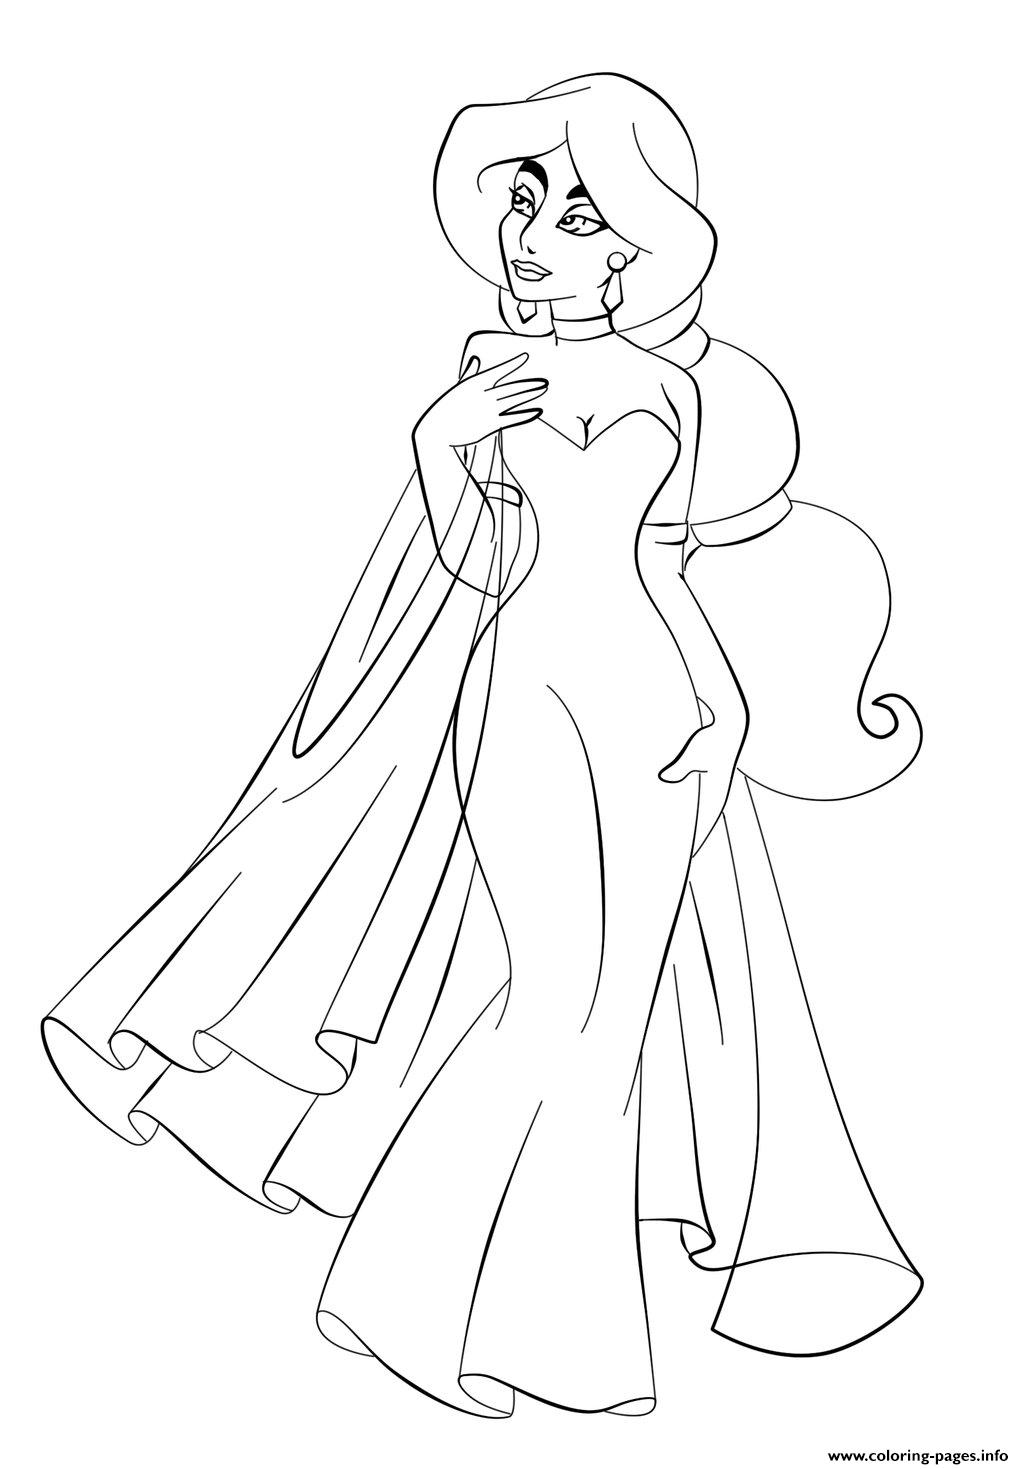 jasmine in wedding dress disney princess s6993 coloring